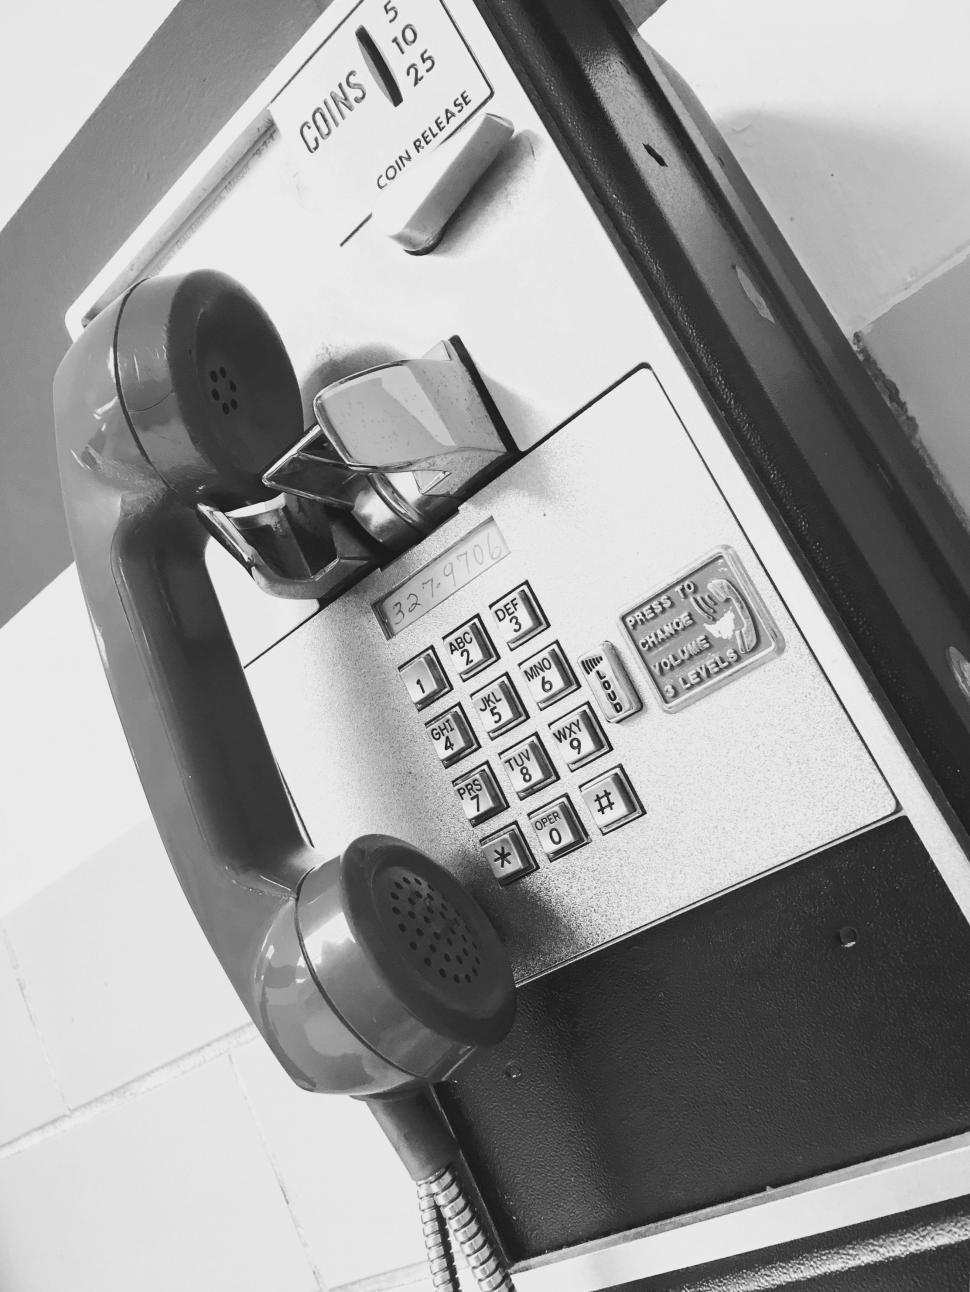 Download Free Stock Photo of Public Telephone - Monochrome